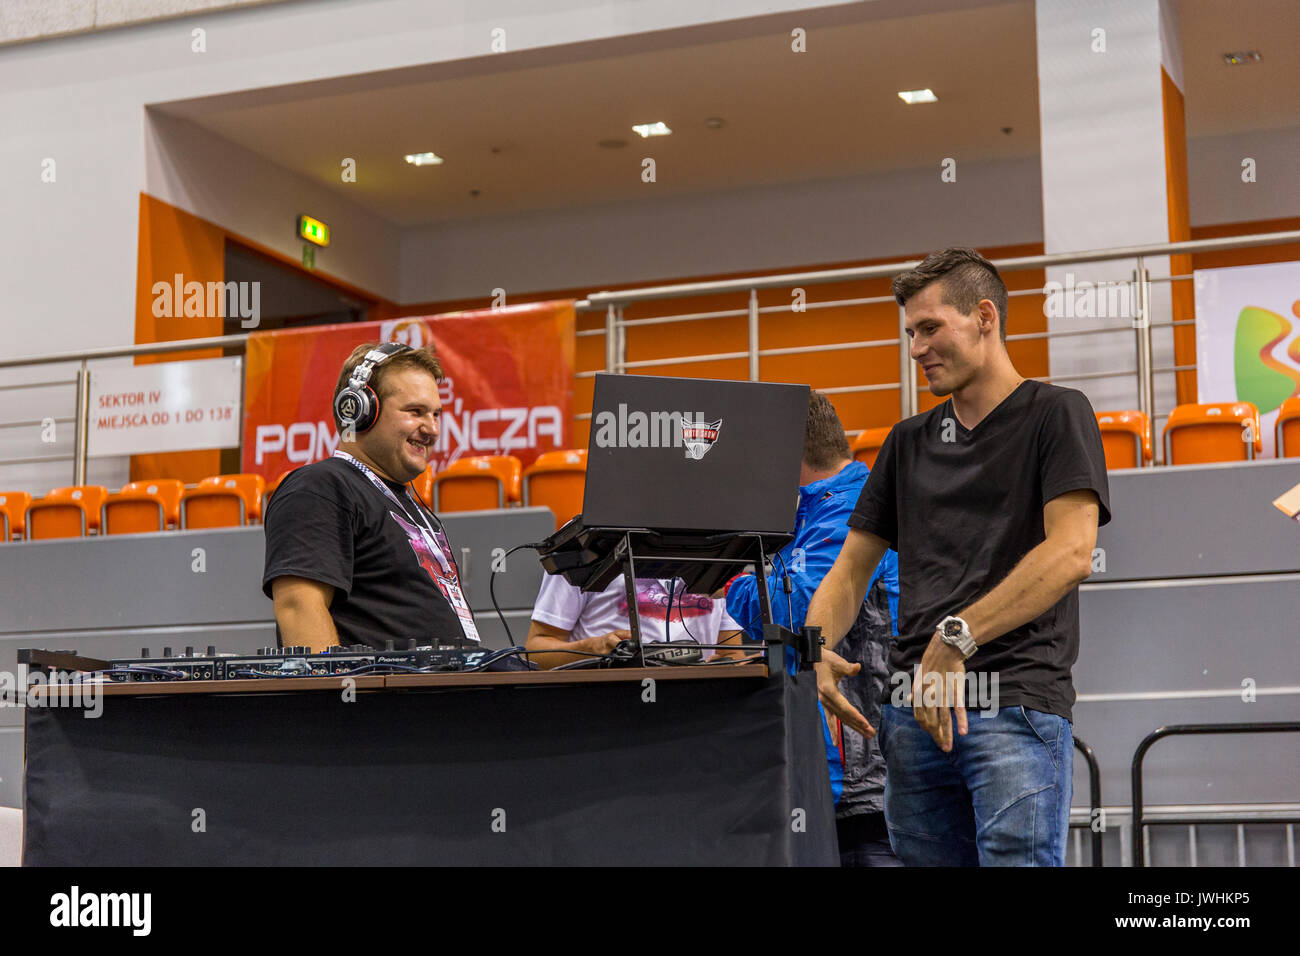 Bielsko-Biala, Poland. 12th Aug, 2017. International automotive trade fairs - MotoShow Bielsko-Biala. Man talking Stock Photo